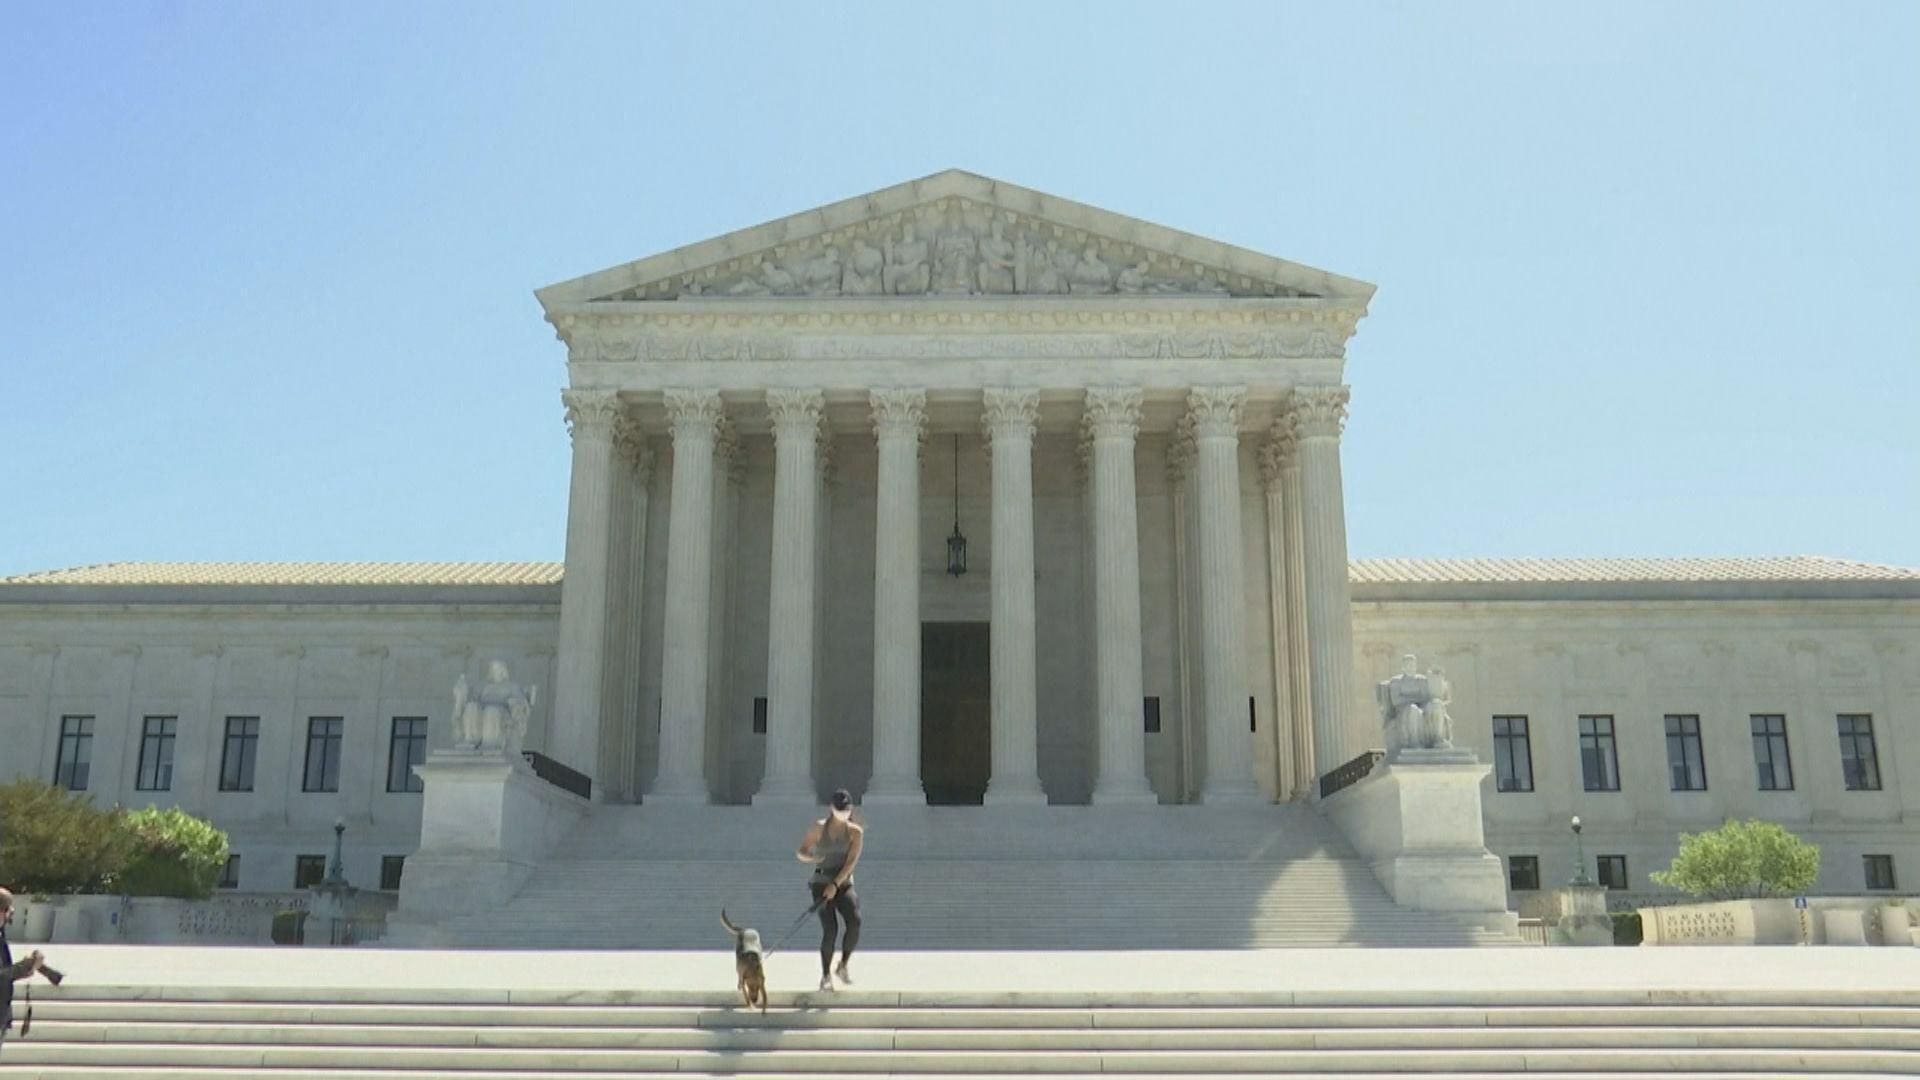 CNN報道稱美國最高法院大樓接炸彈恐嚇